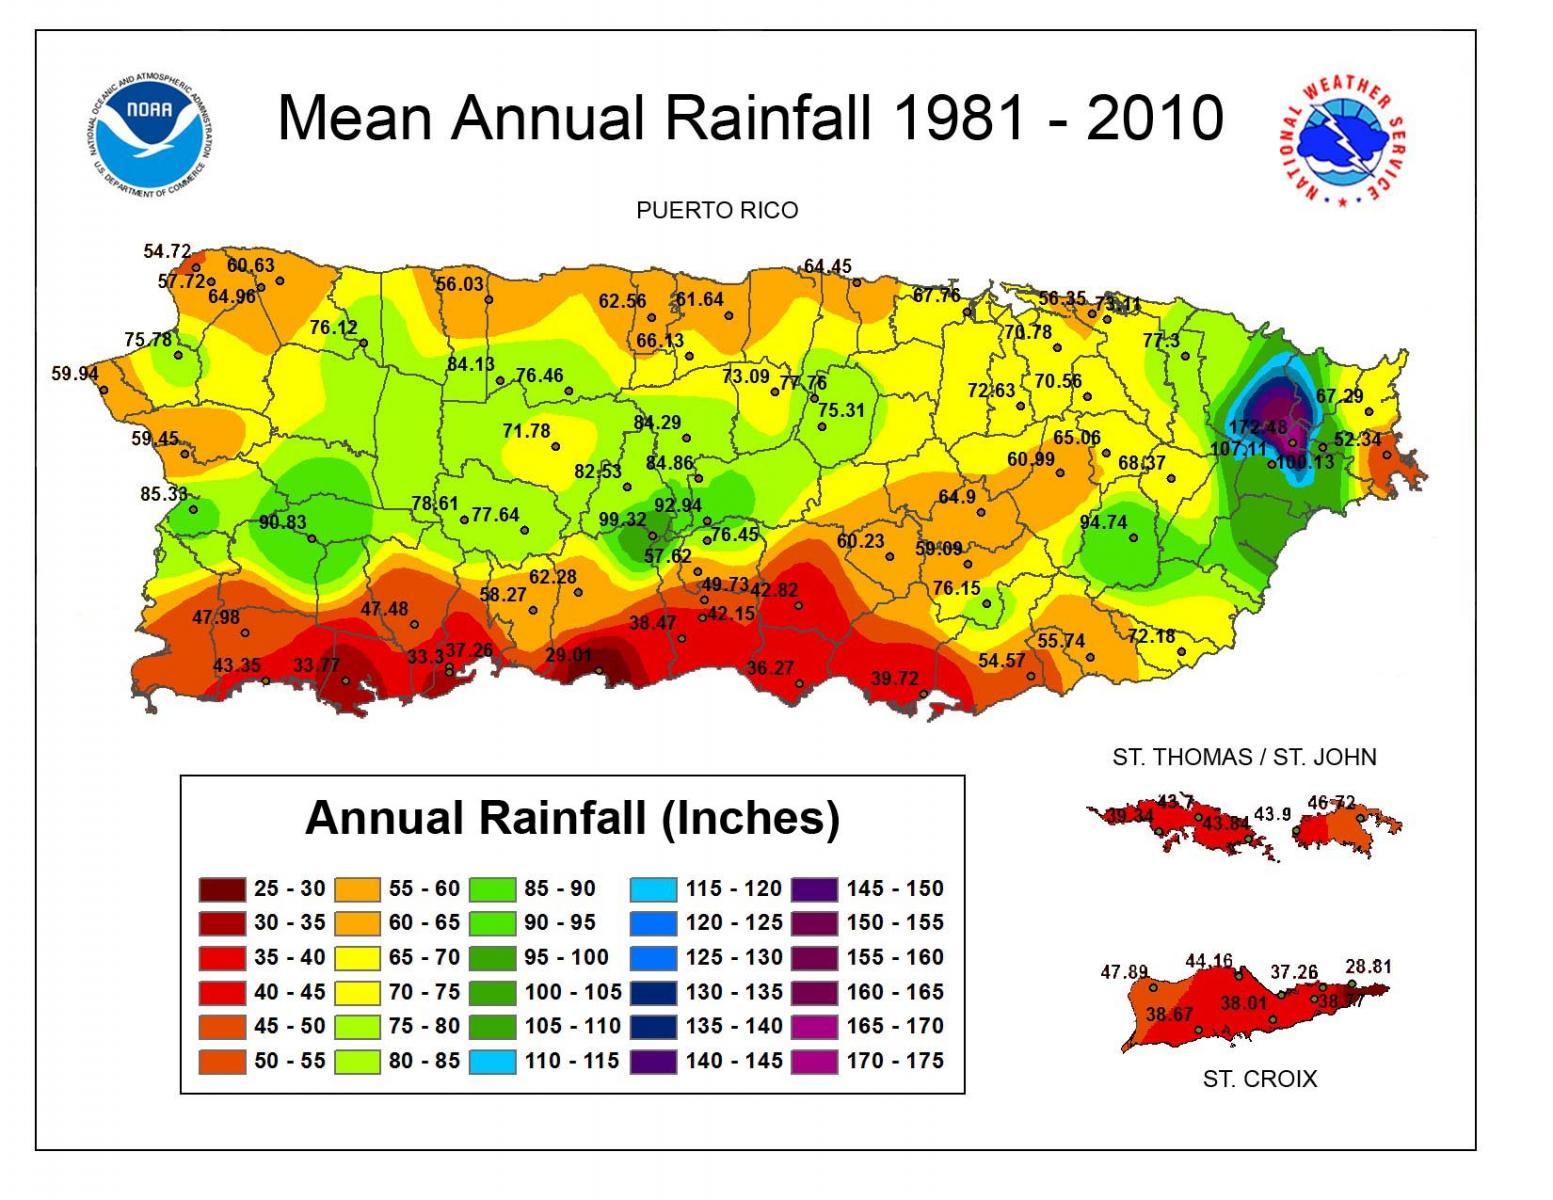 Wfo San Juan Hydrology And River Information